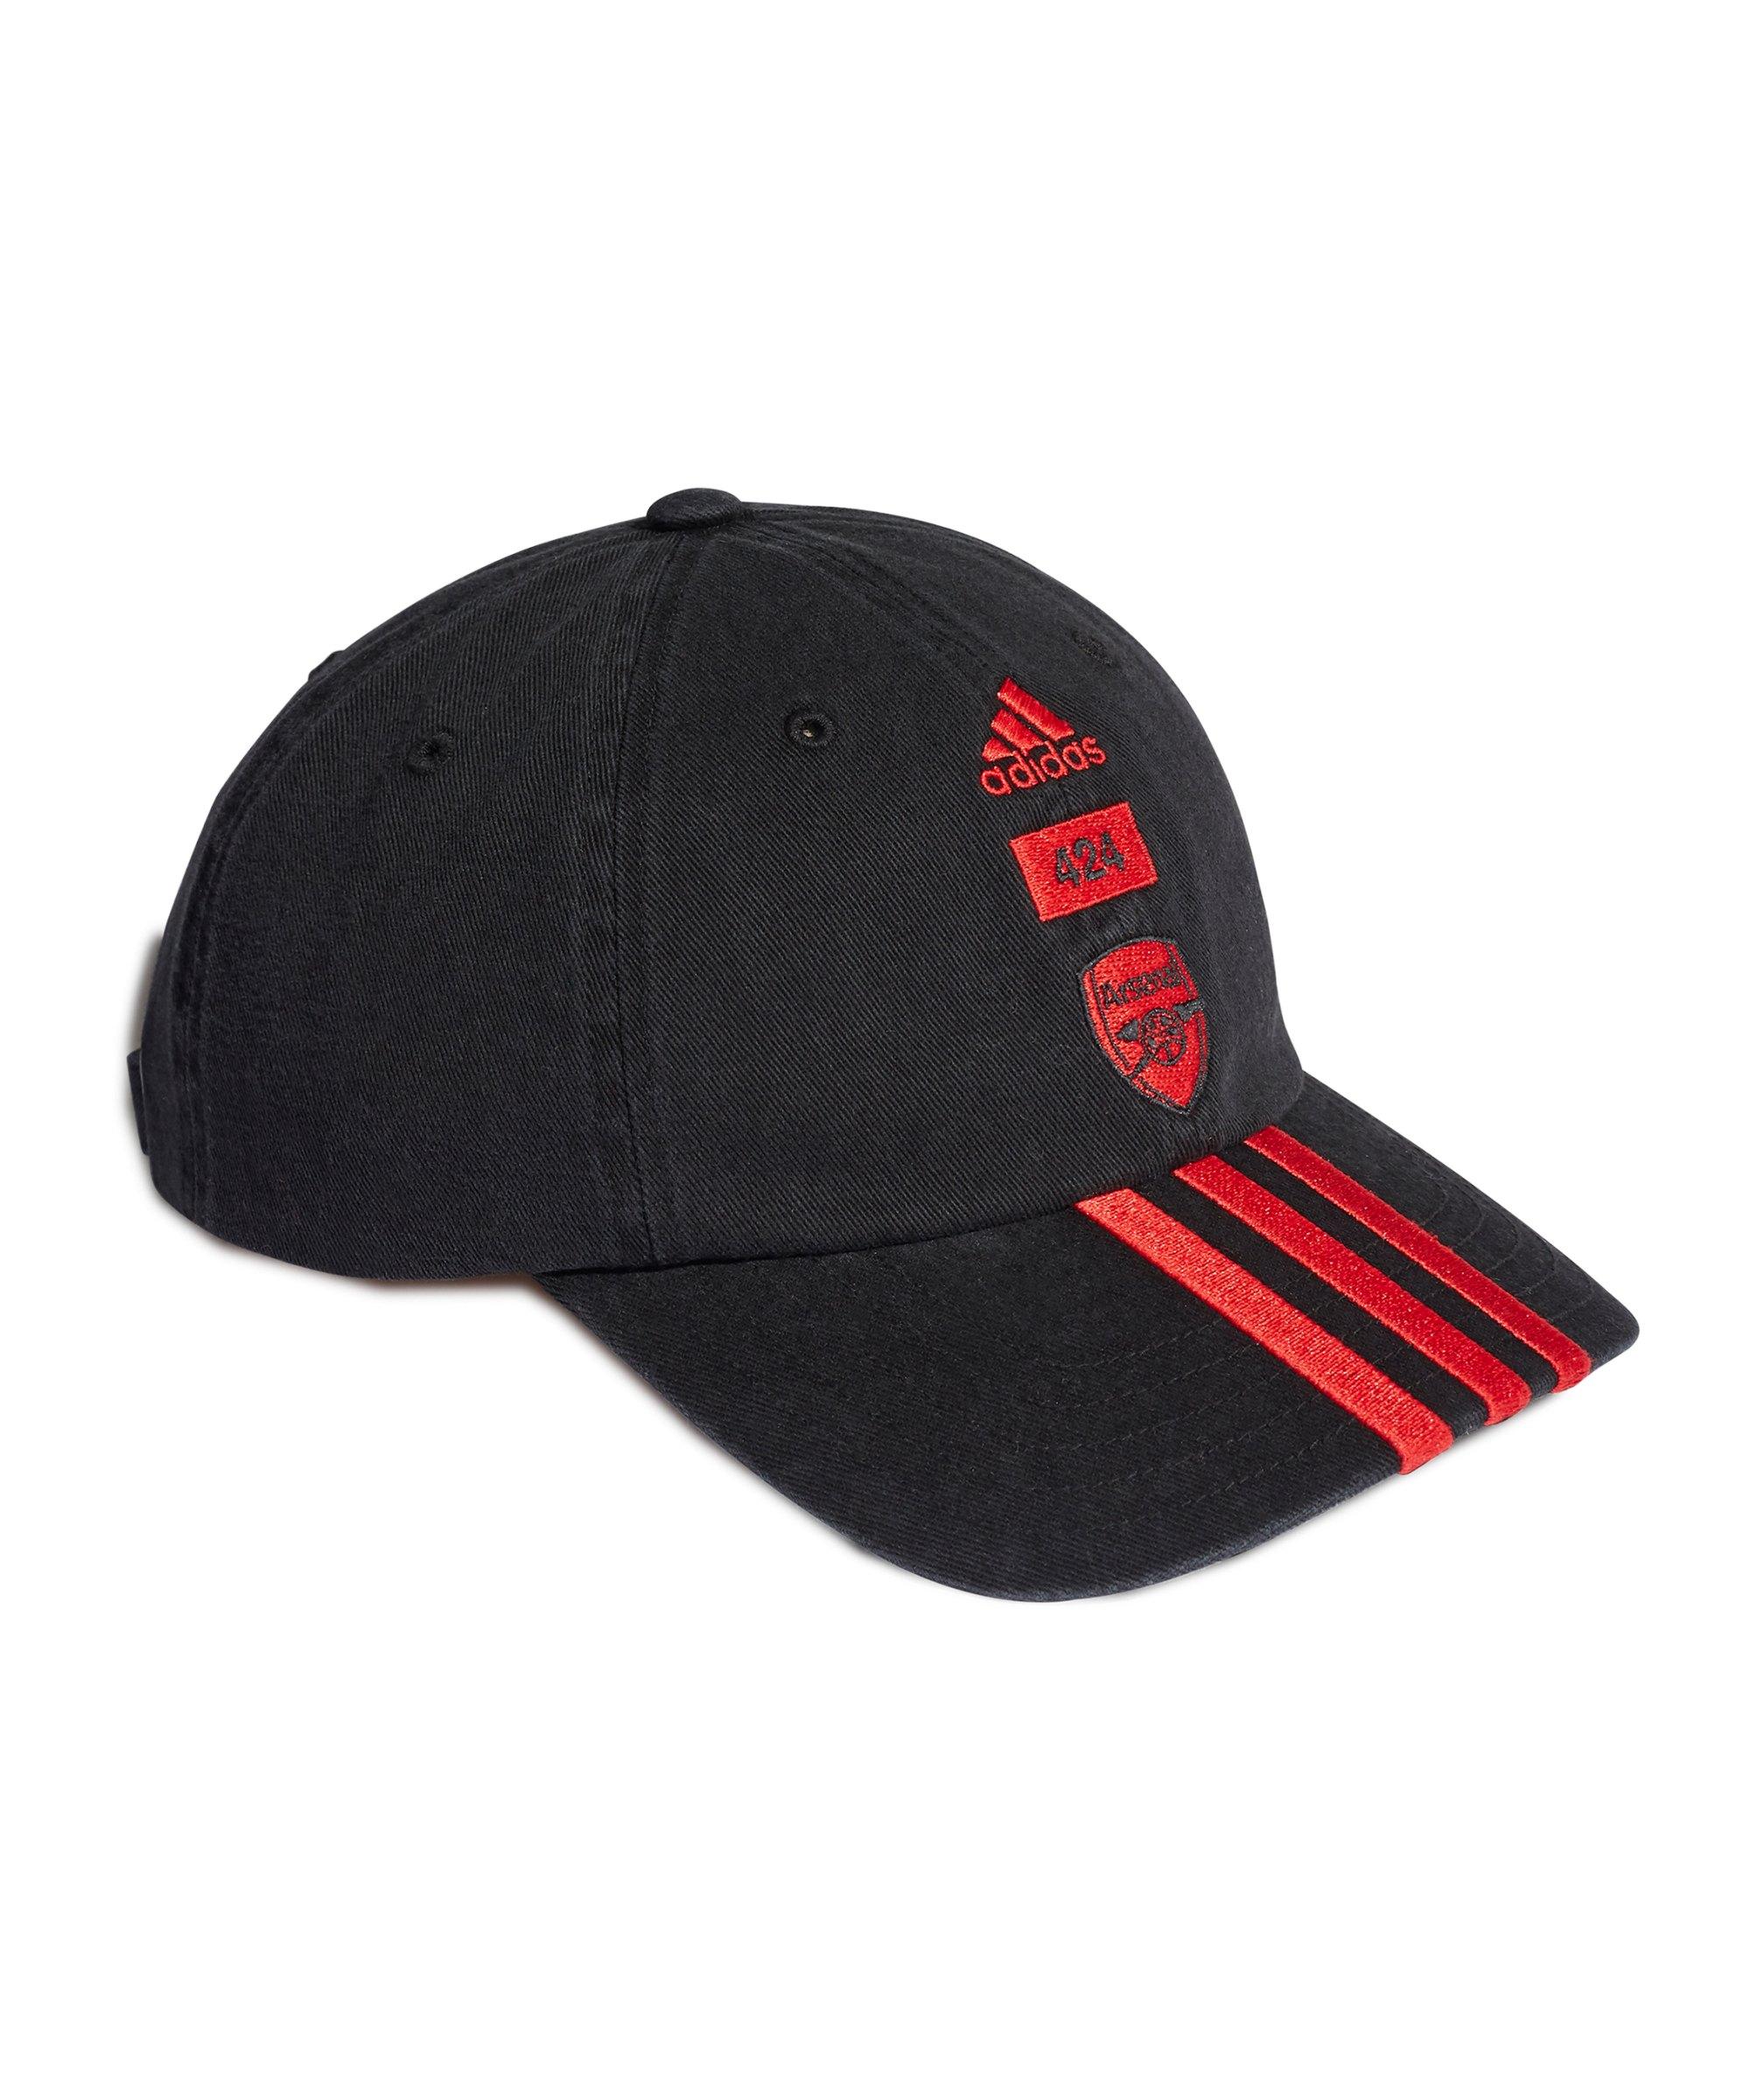 adidas FC Arsenal London x 424 Cap Schwarz - schwarz